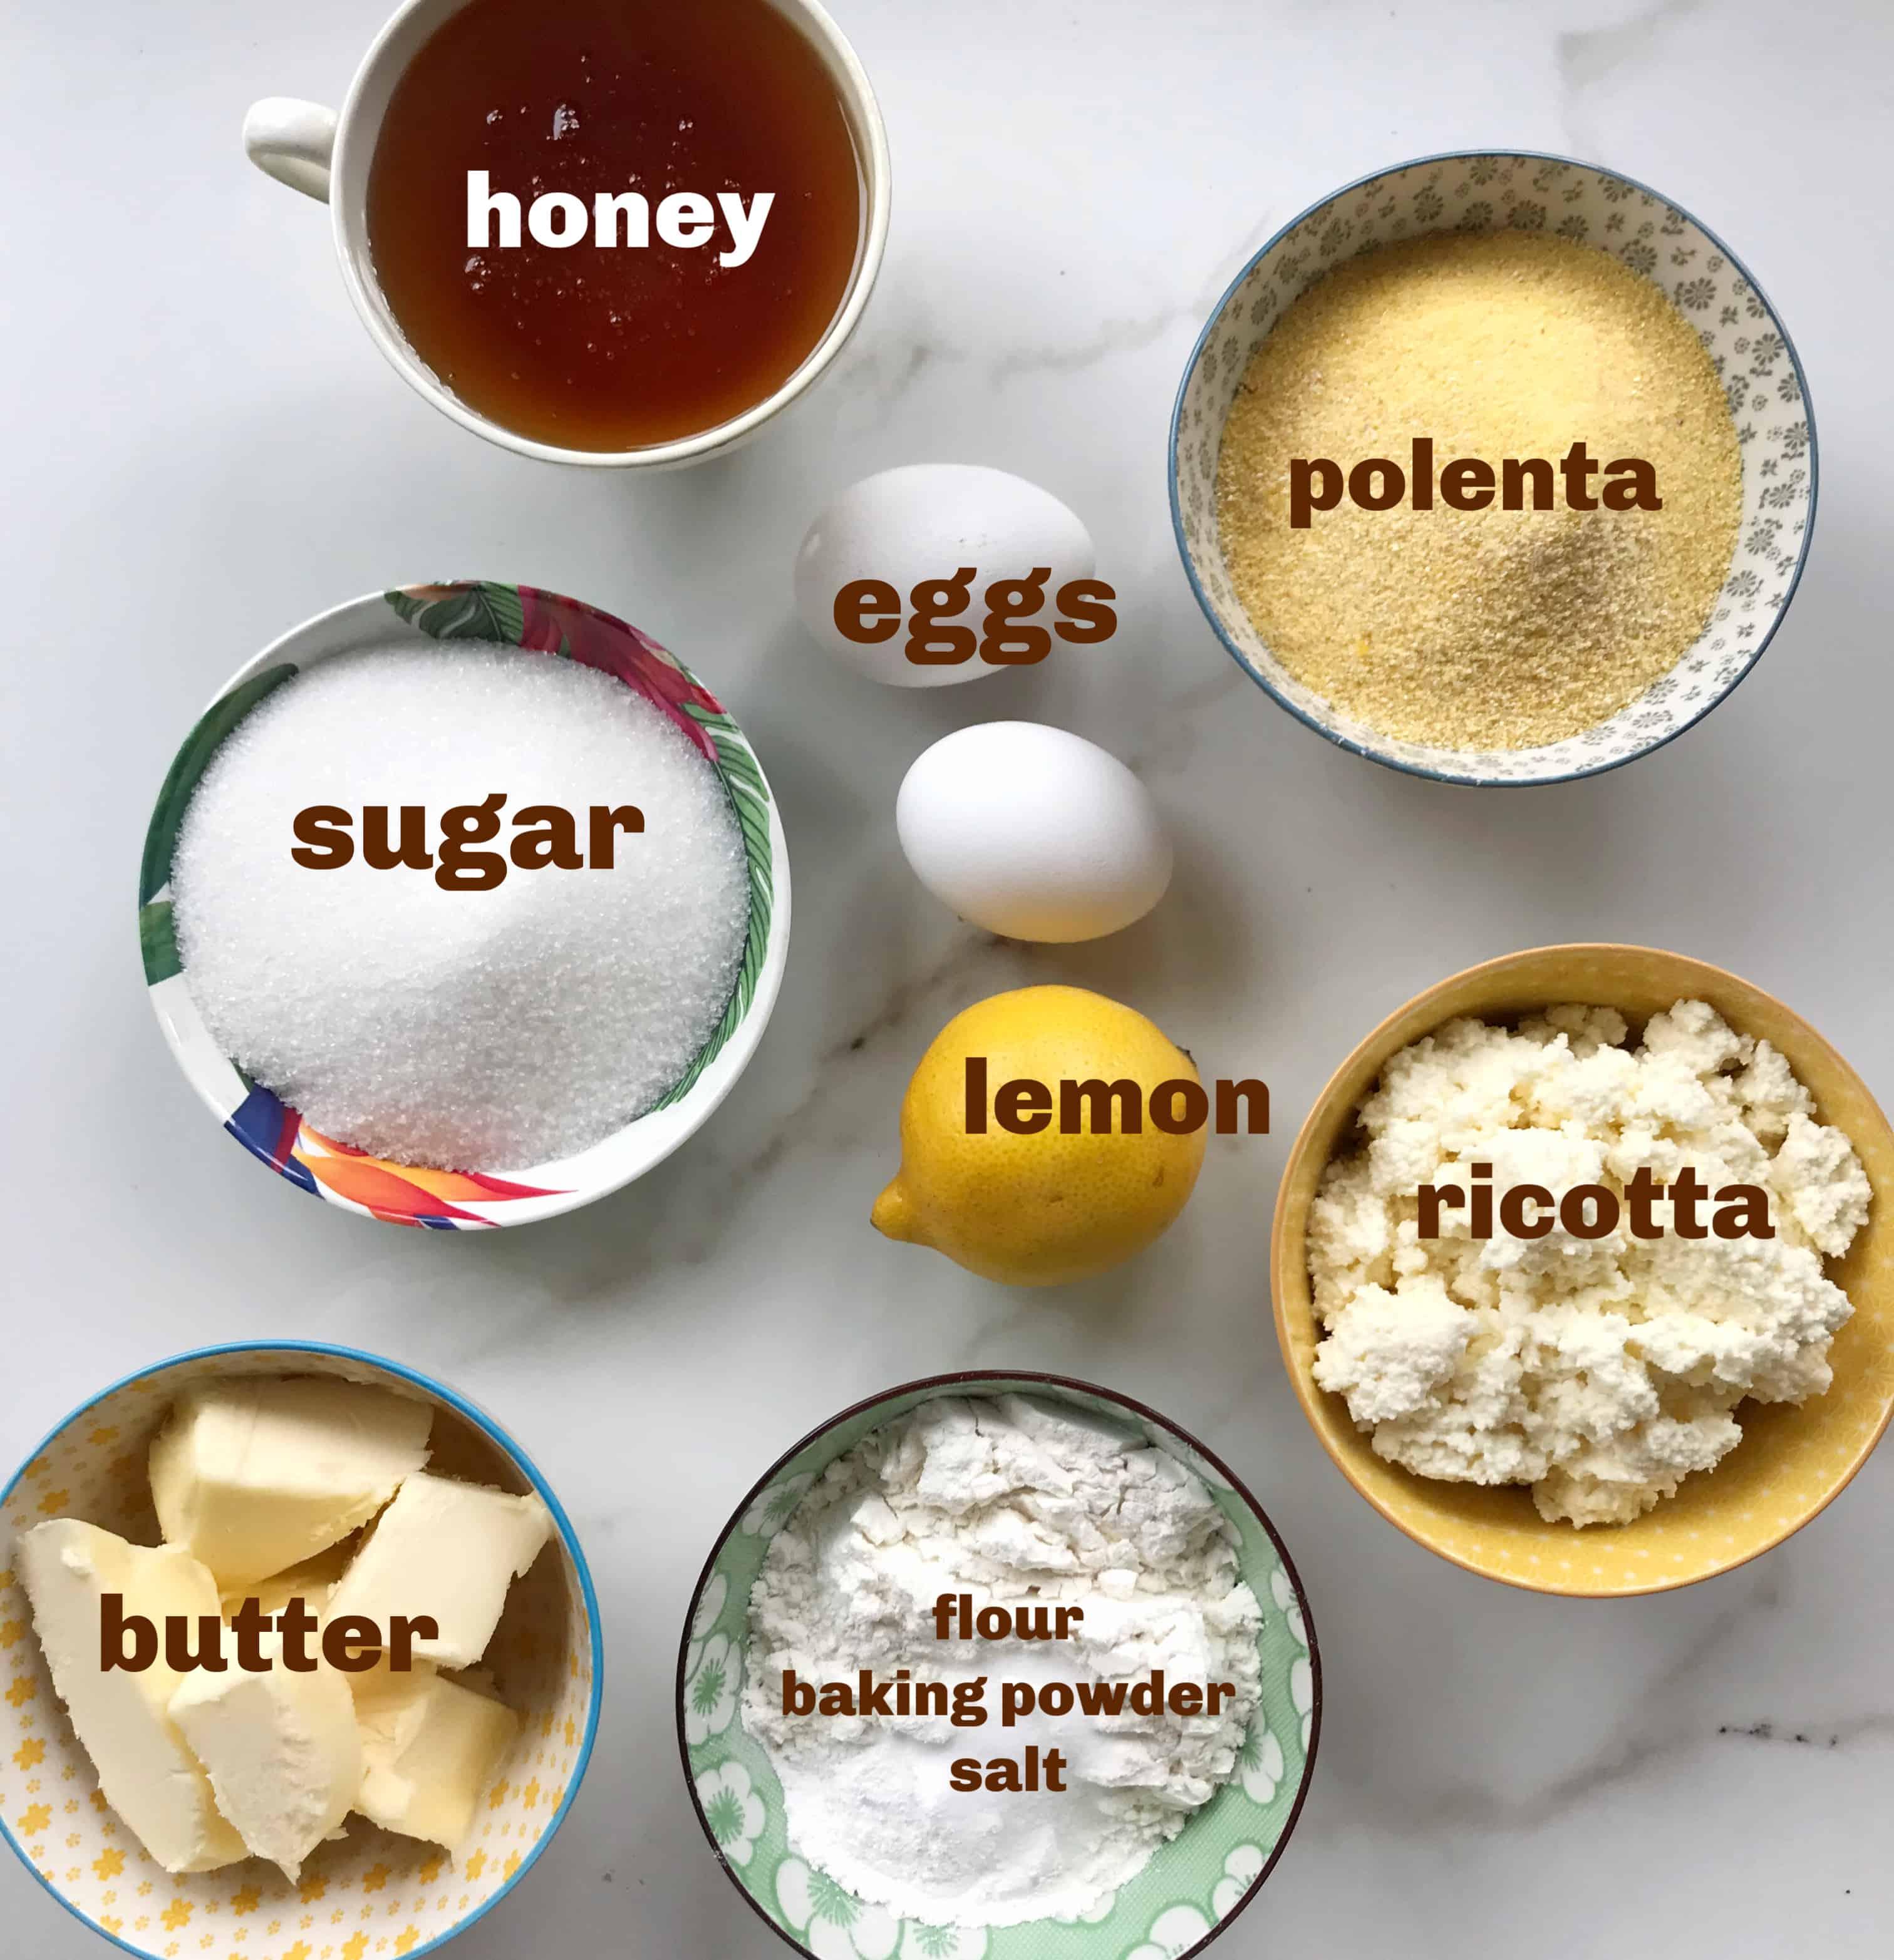 lemon polenta ricotta cake ingredients in bowls on white surface